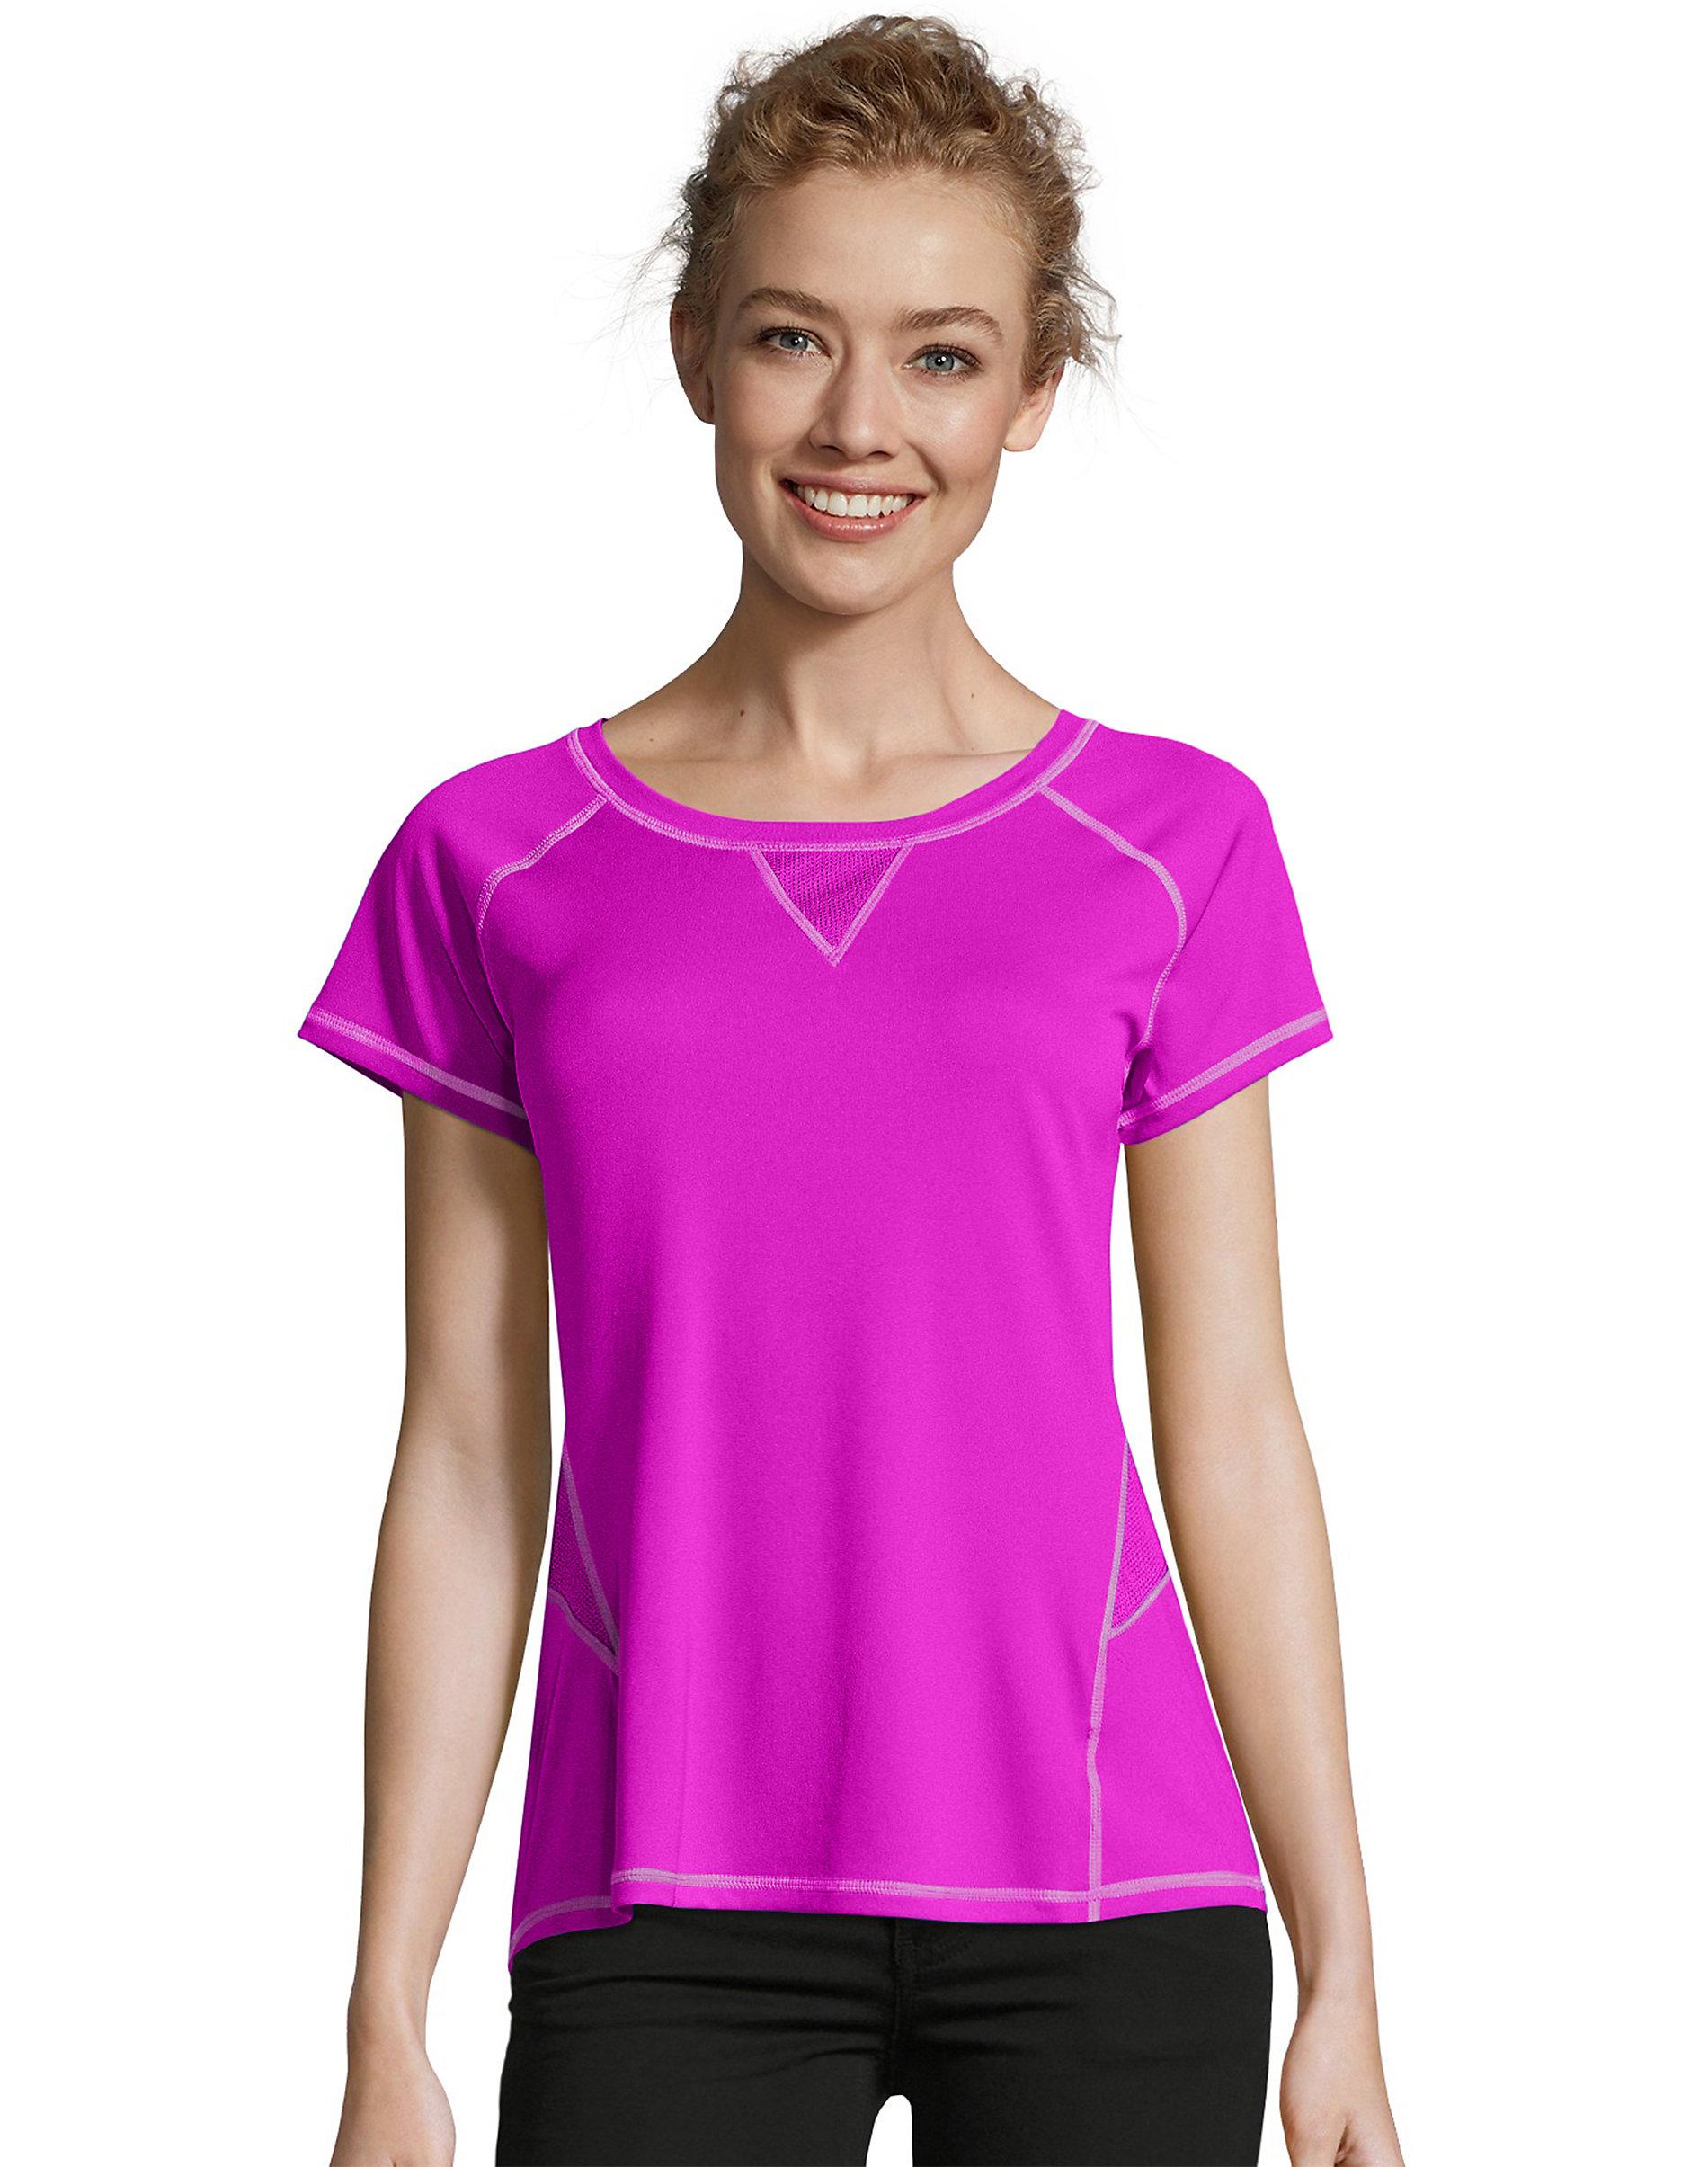 Hanes-Women-039-s-Tee-Shirt-Mesh-Insets-Performance-Sport-Cool-DRI-Comfort-Pocket